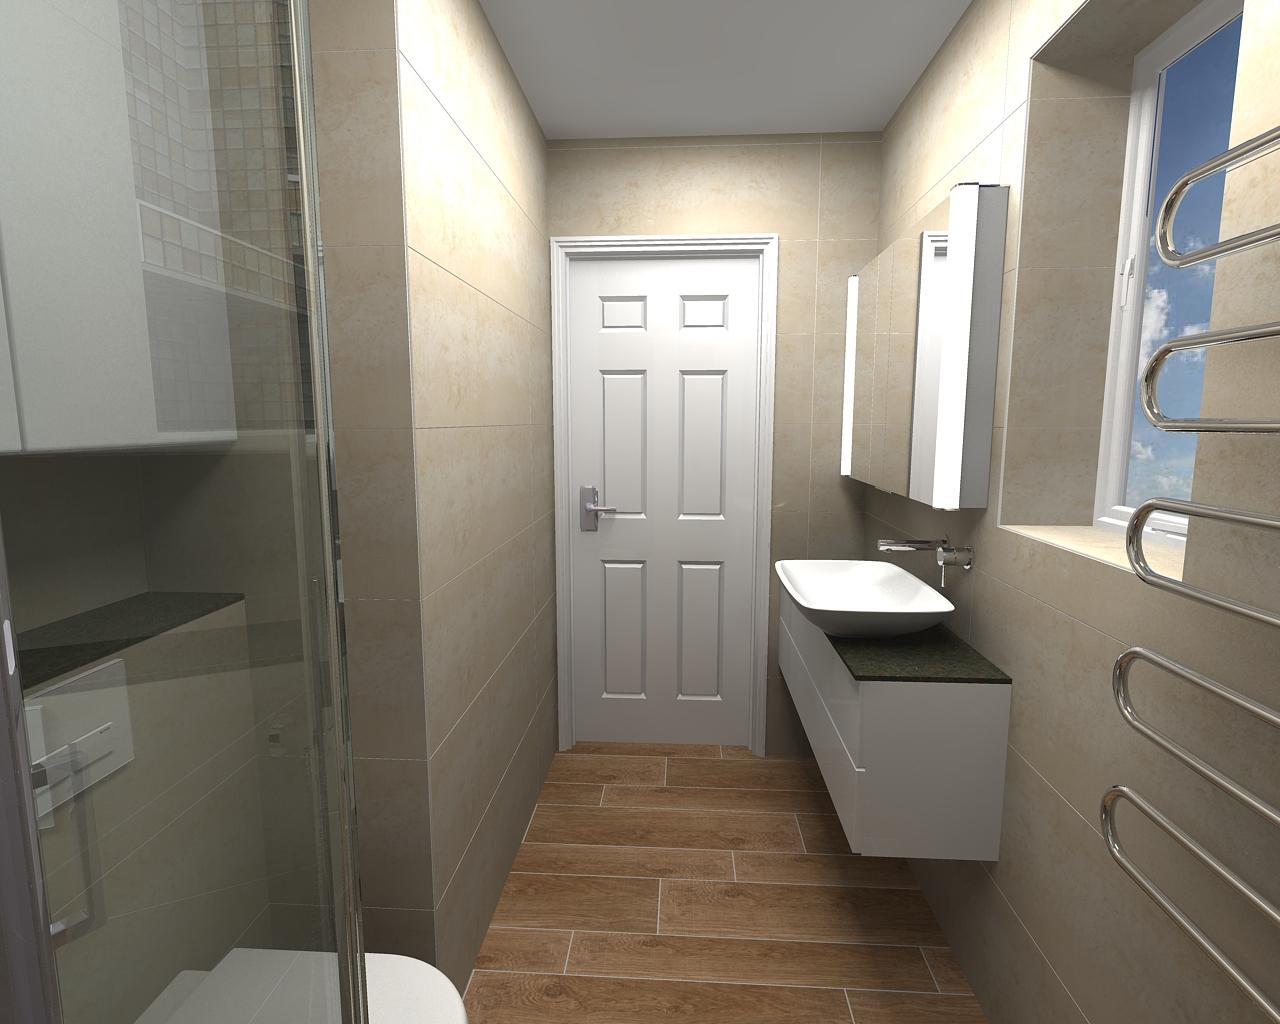 Small En Suite Bathrooms: Ensuite Shower Room